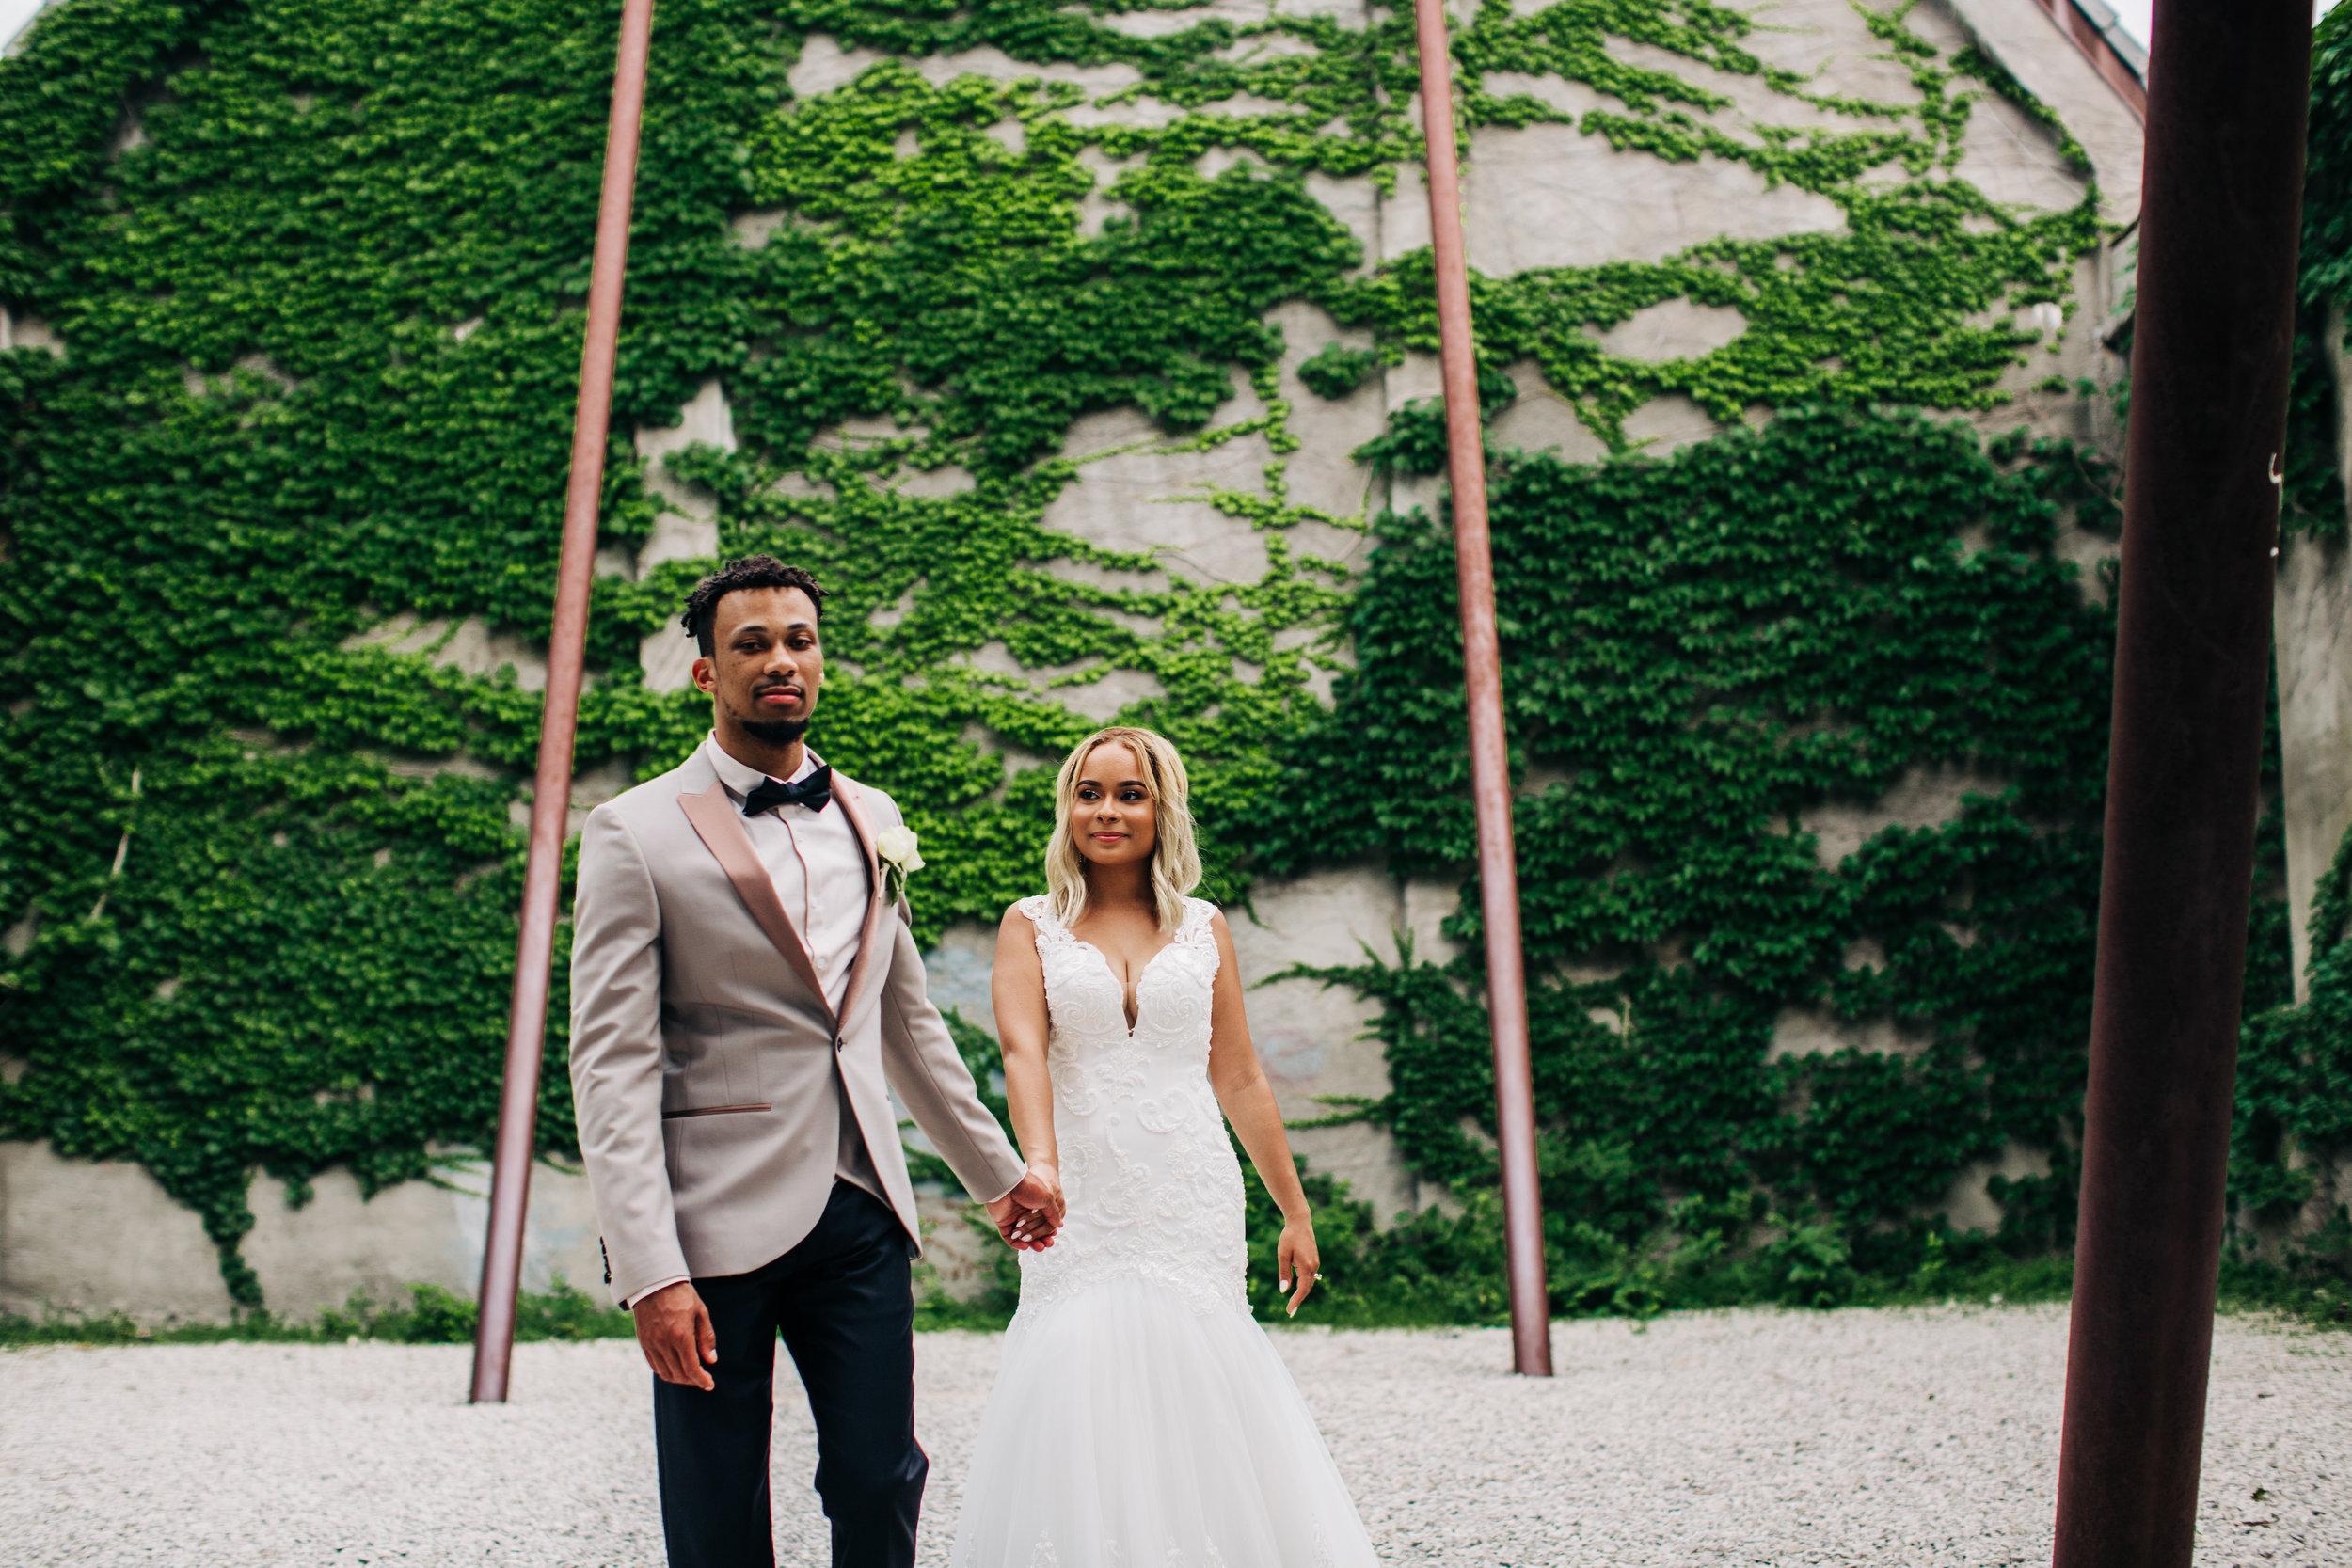 Ashley Pieper Photography | Wedding, Elopement, & Destination Photographer | St. Louis Mo